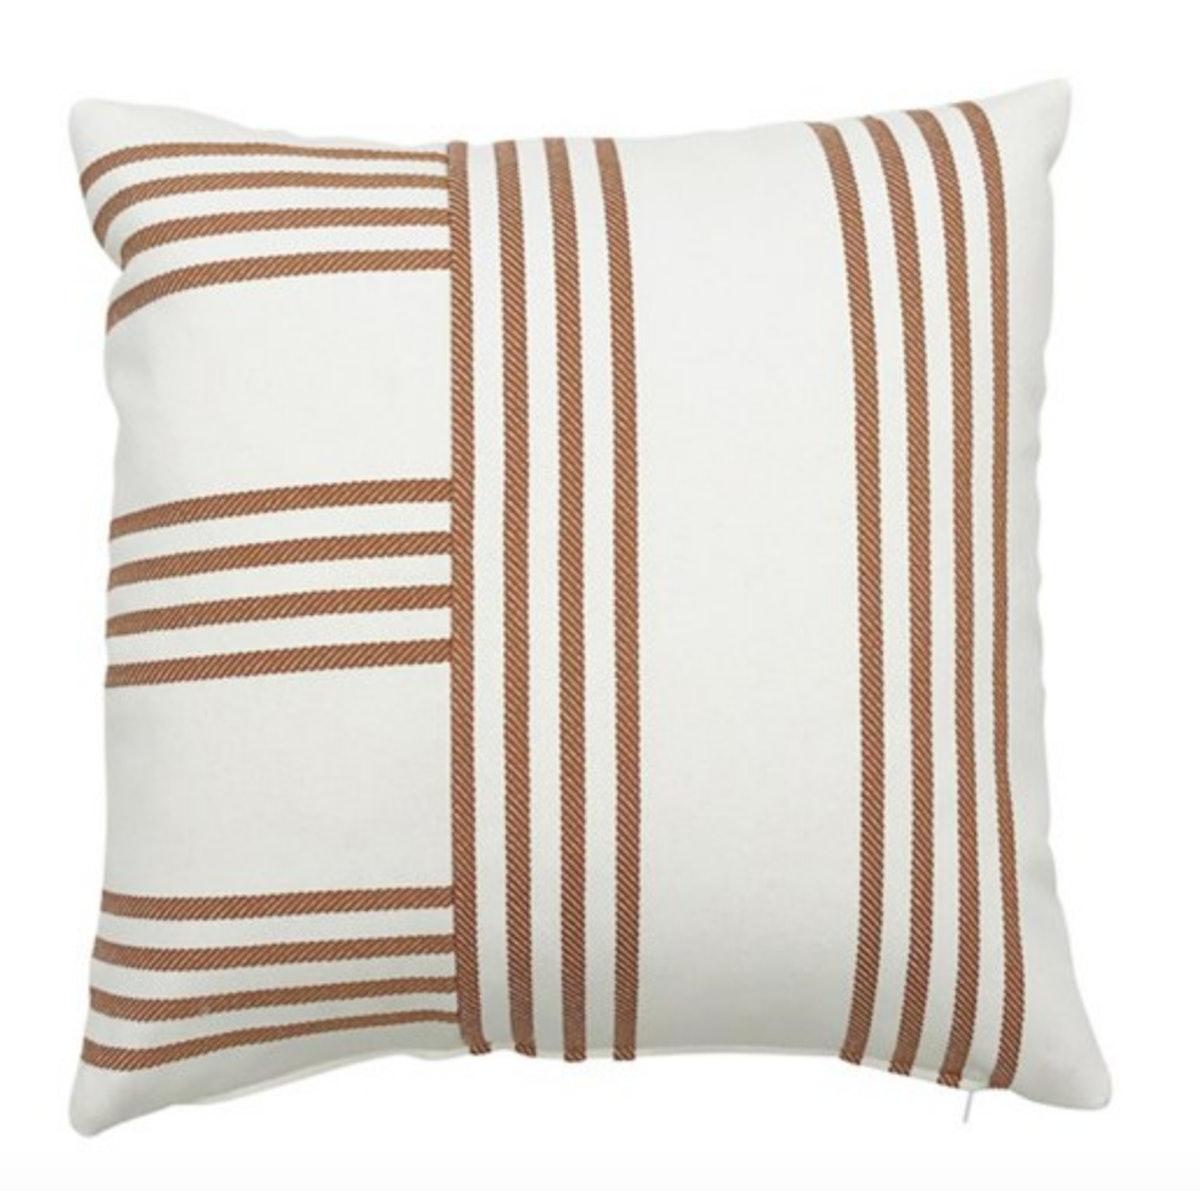 Further 20x20 Outdoor Pillow